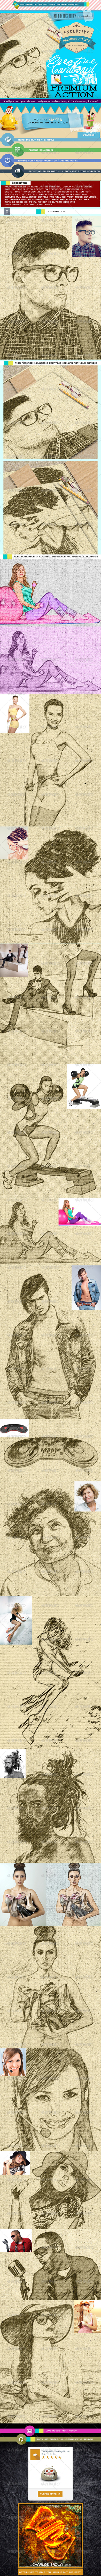 GraphicRiver Creative Cardboard Fashion Sketch 6237991